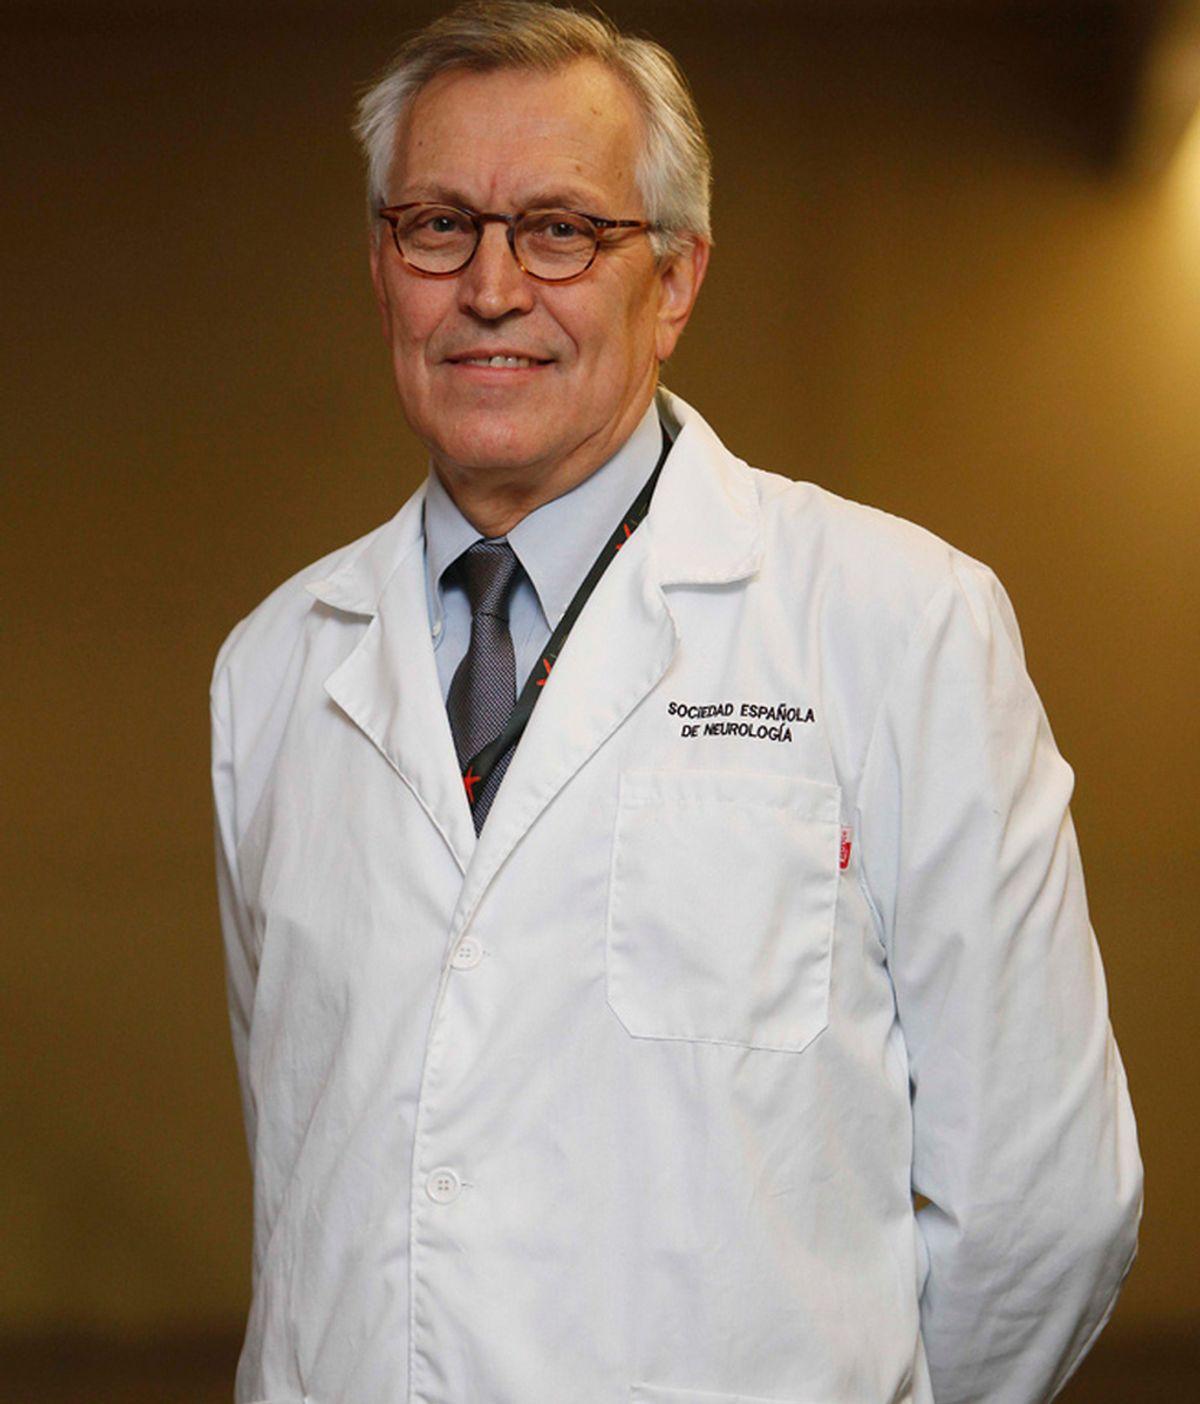 Dr. Jaime Gállego